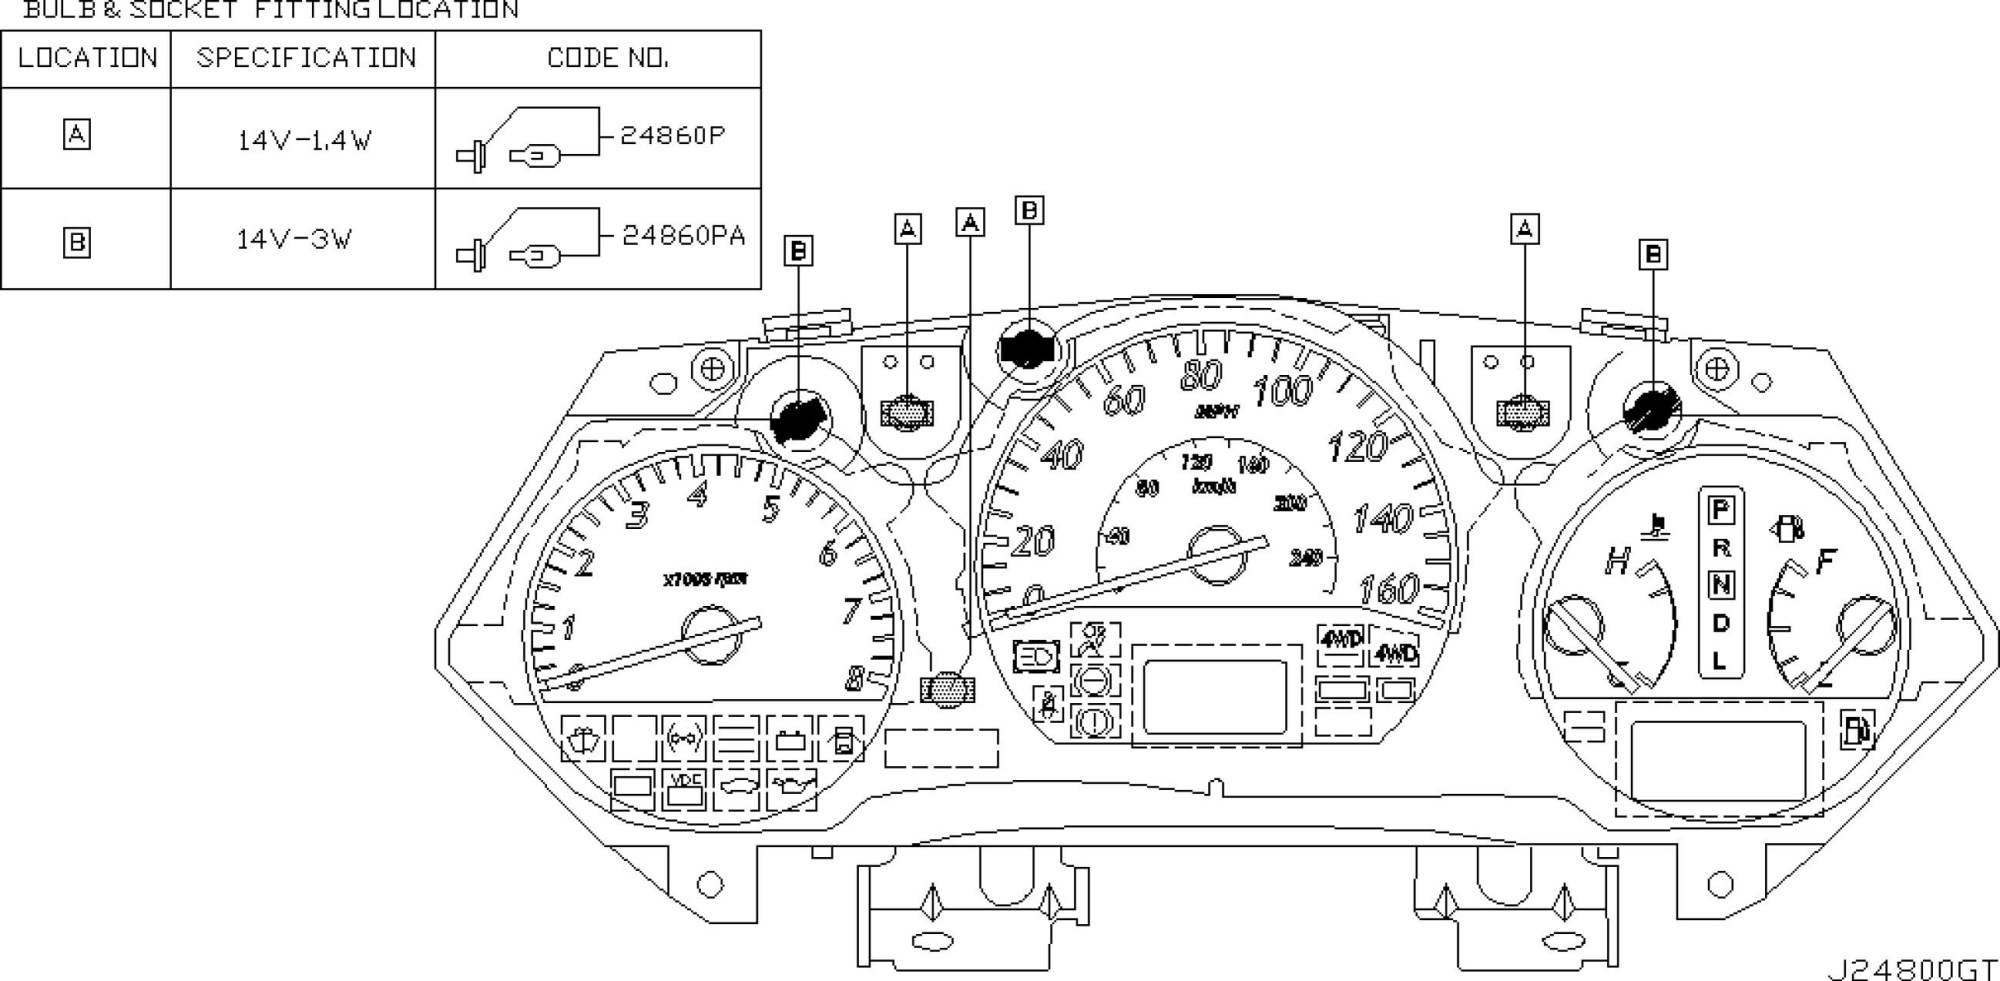 hight resolution of 1999 nissan altima engine diagram 2007 nissan altima bination lamp xenontype parts diagram car of 1999